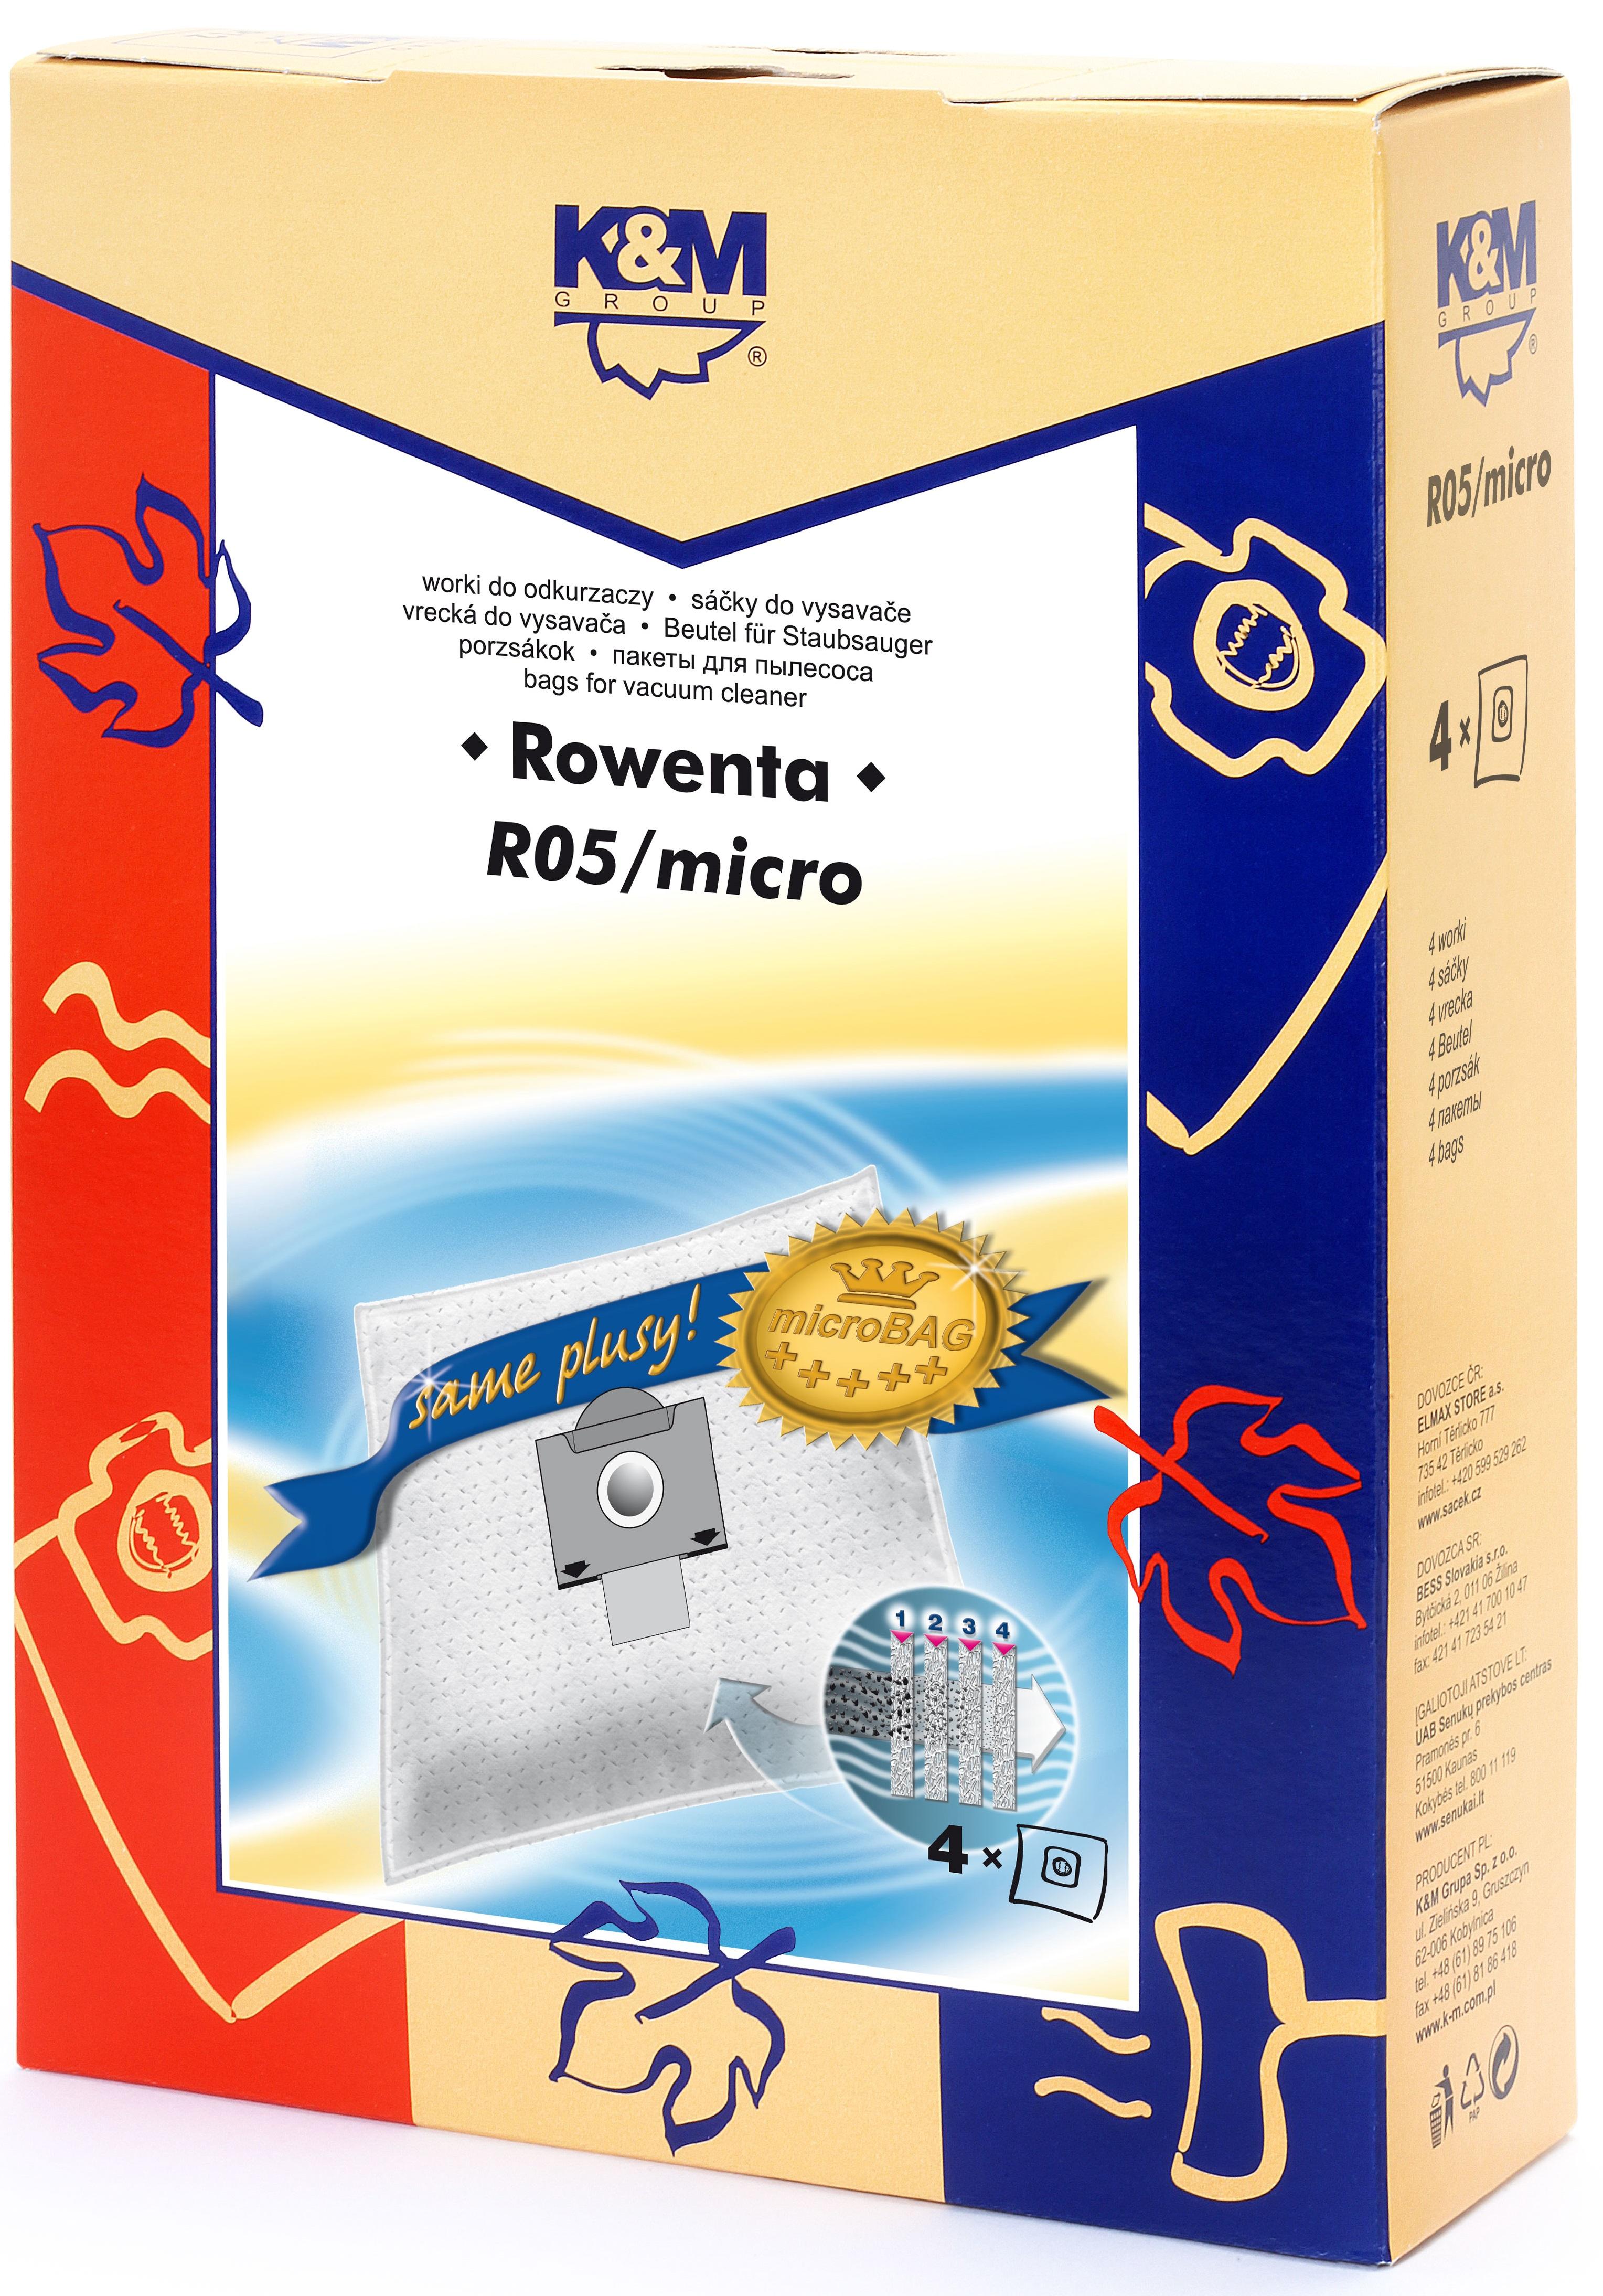 Sac aspirator Rowenta ZR76, sintetic, 4X saci, K&M 0